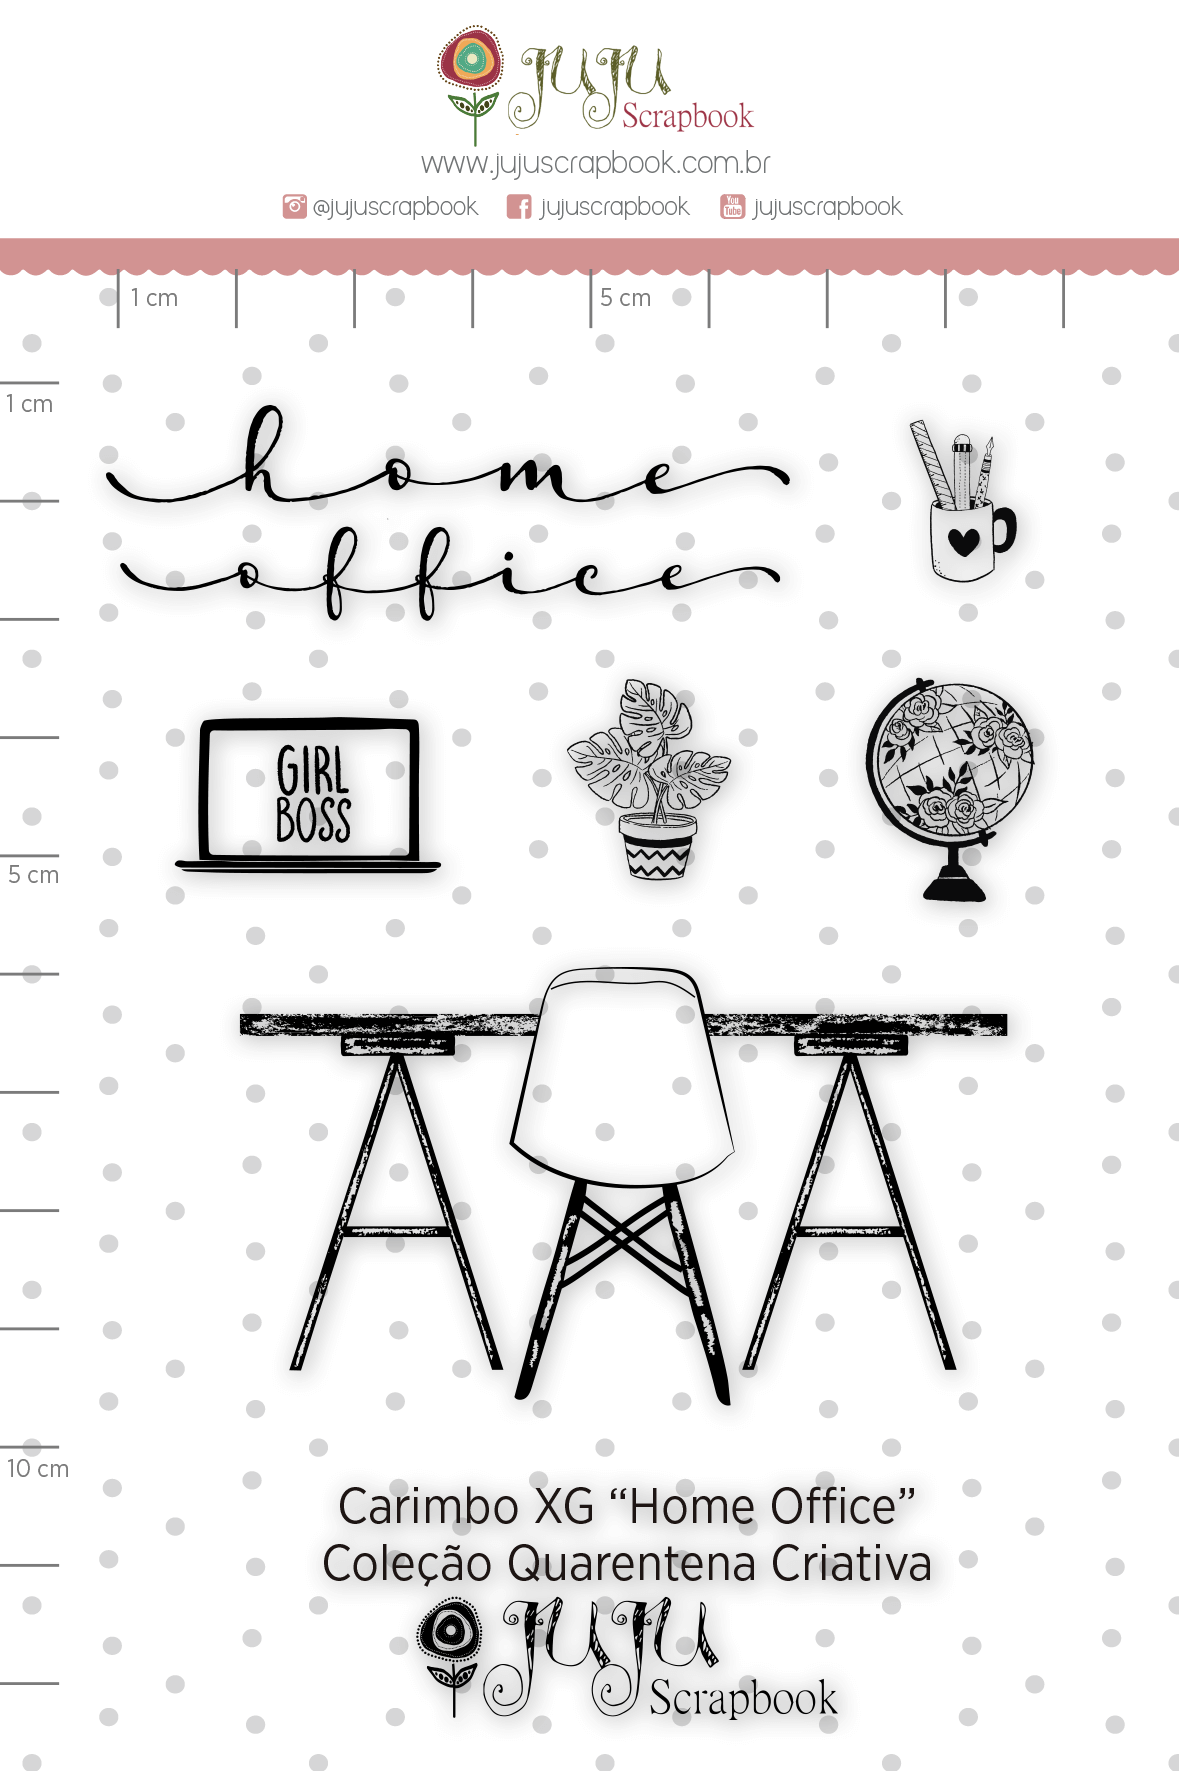 Carimbo XG Home Office - Coleção Quarentena Criativa - Juju Scrapbook  - JuJu Scrapbook